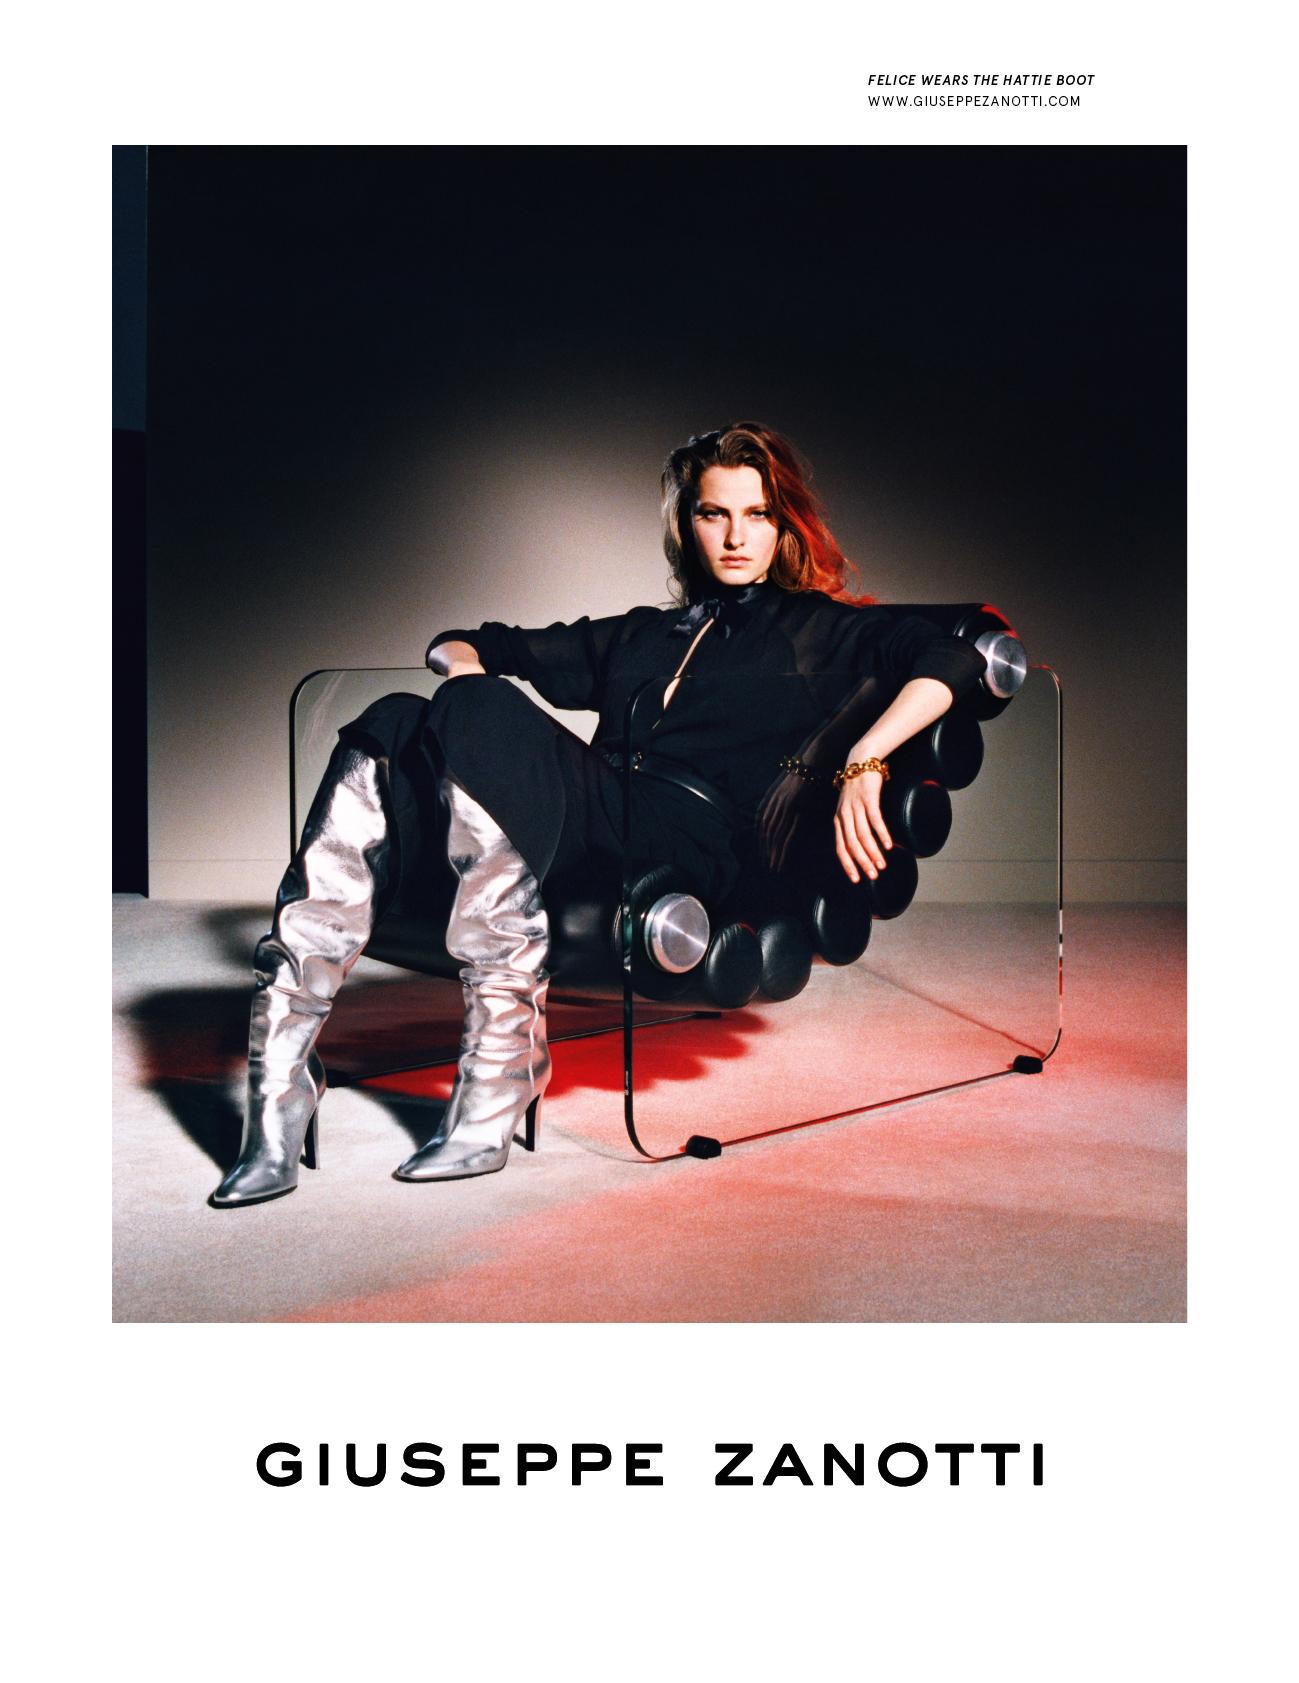 Shot by Suffo Moncloa for Giuseppe Zanotti